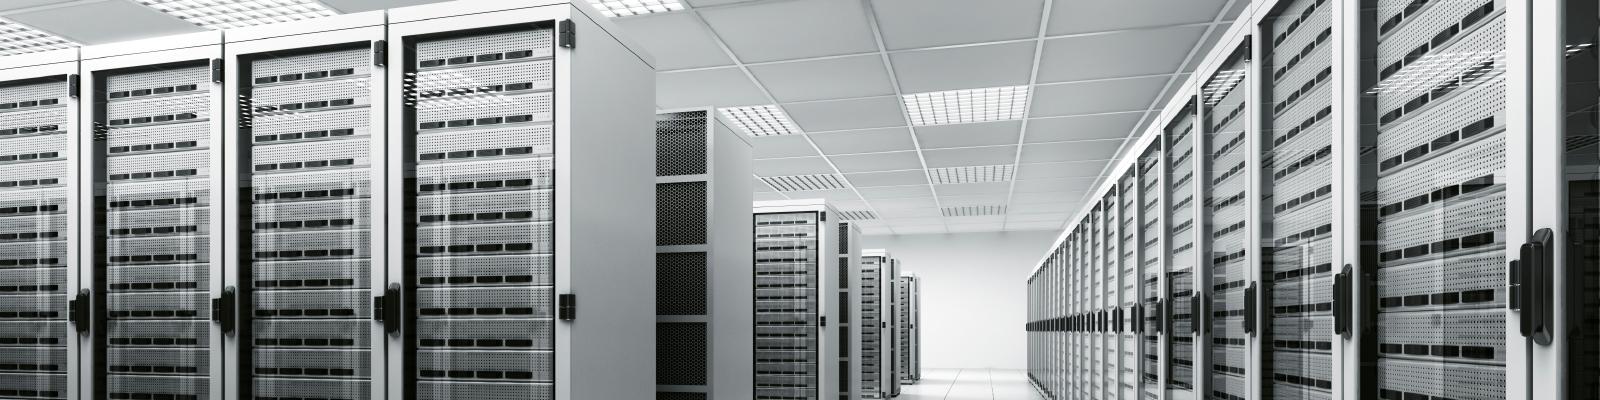 slider-server-room